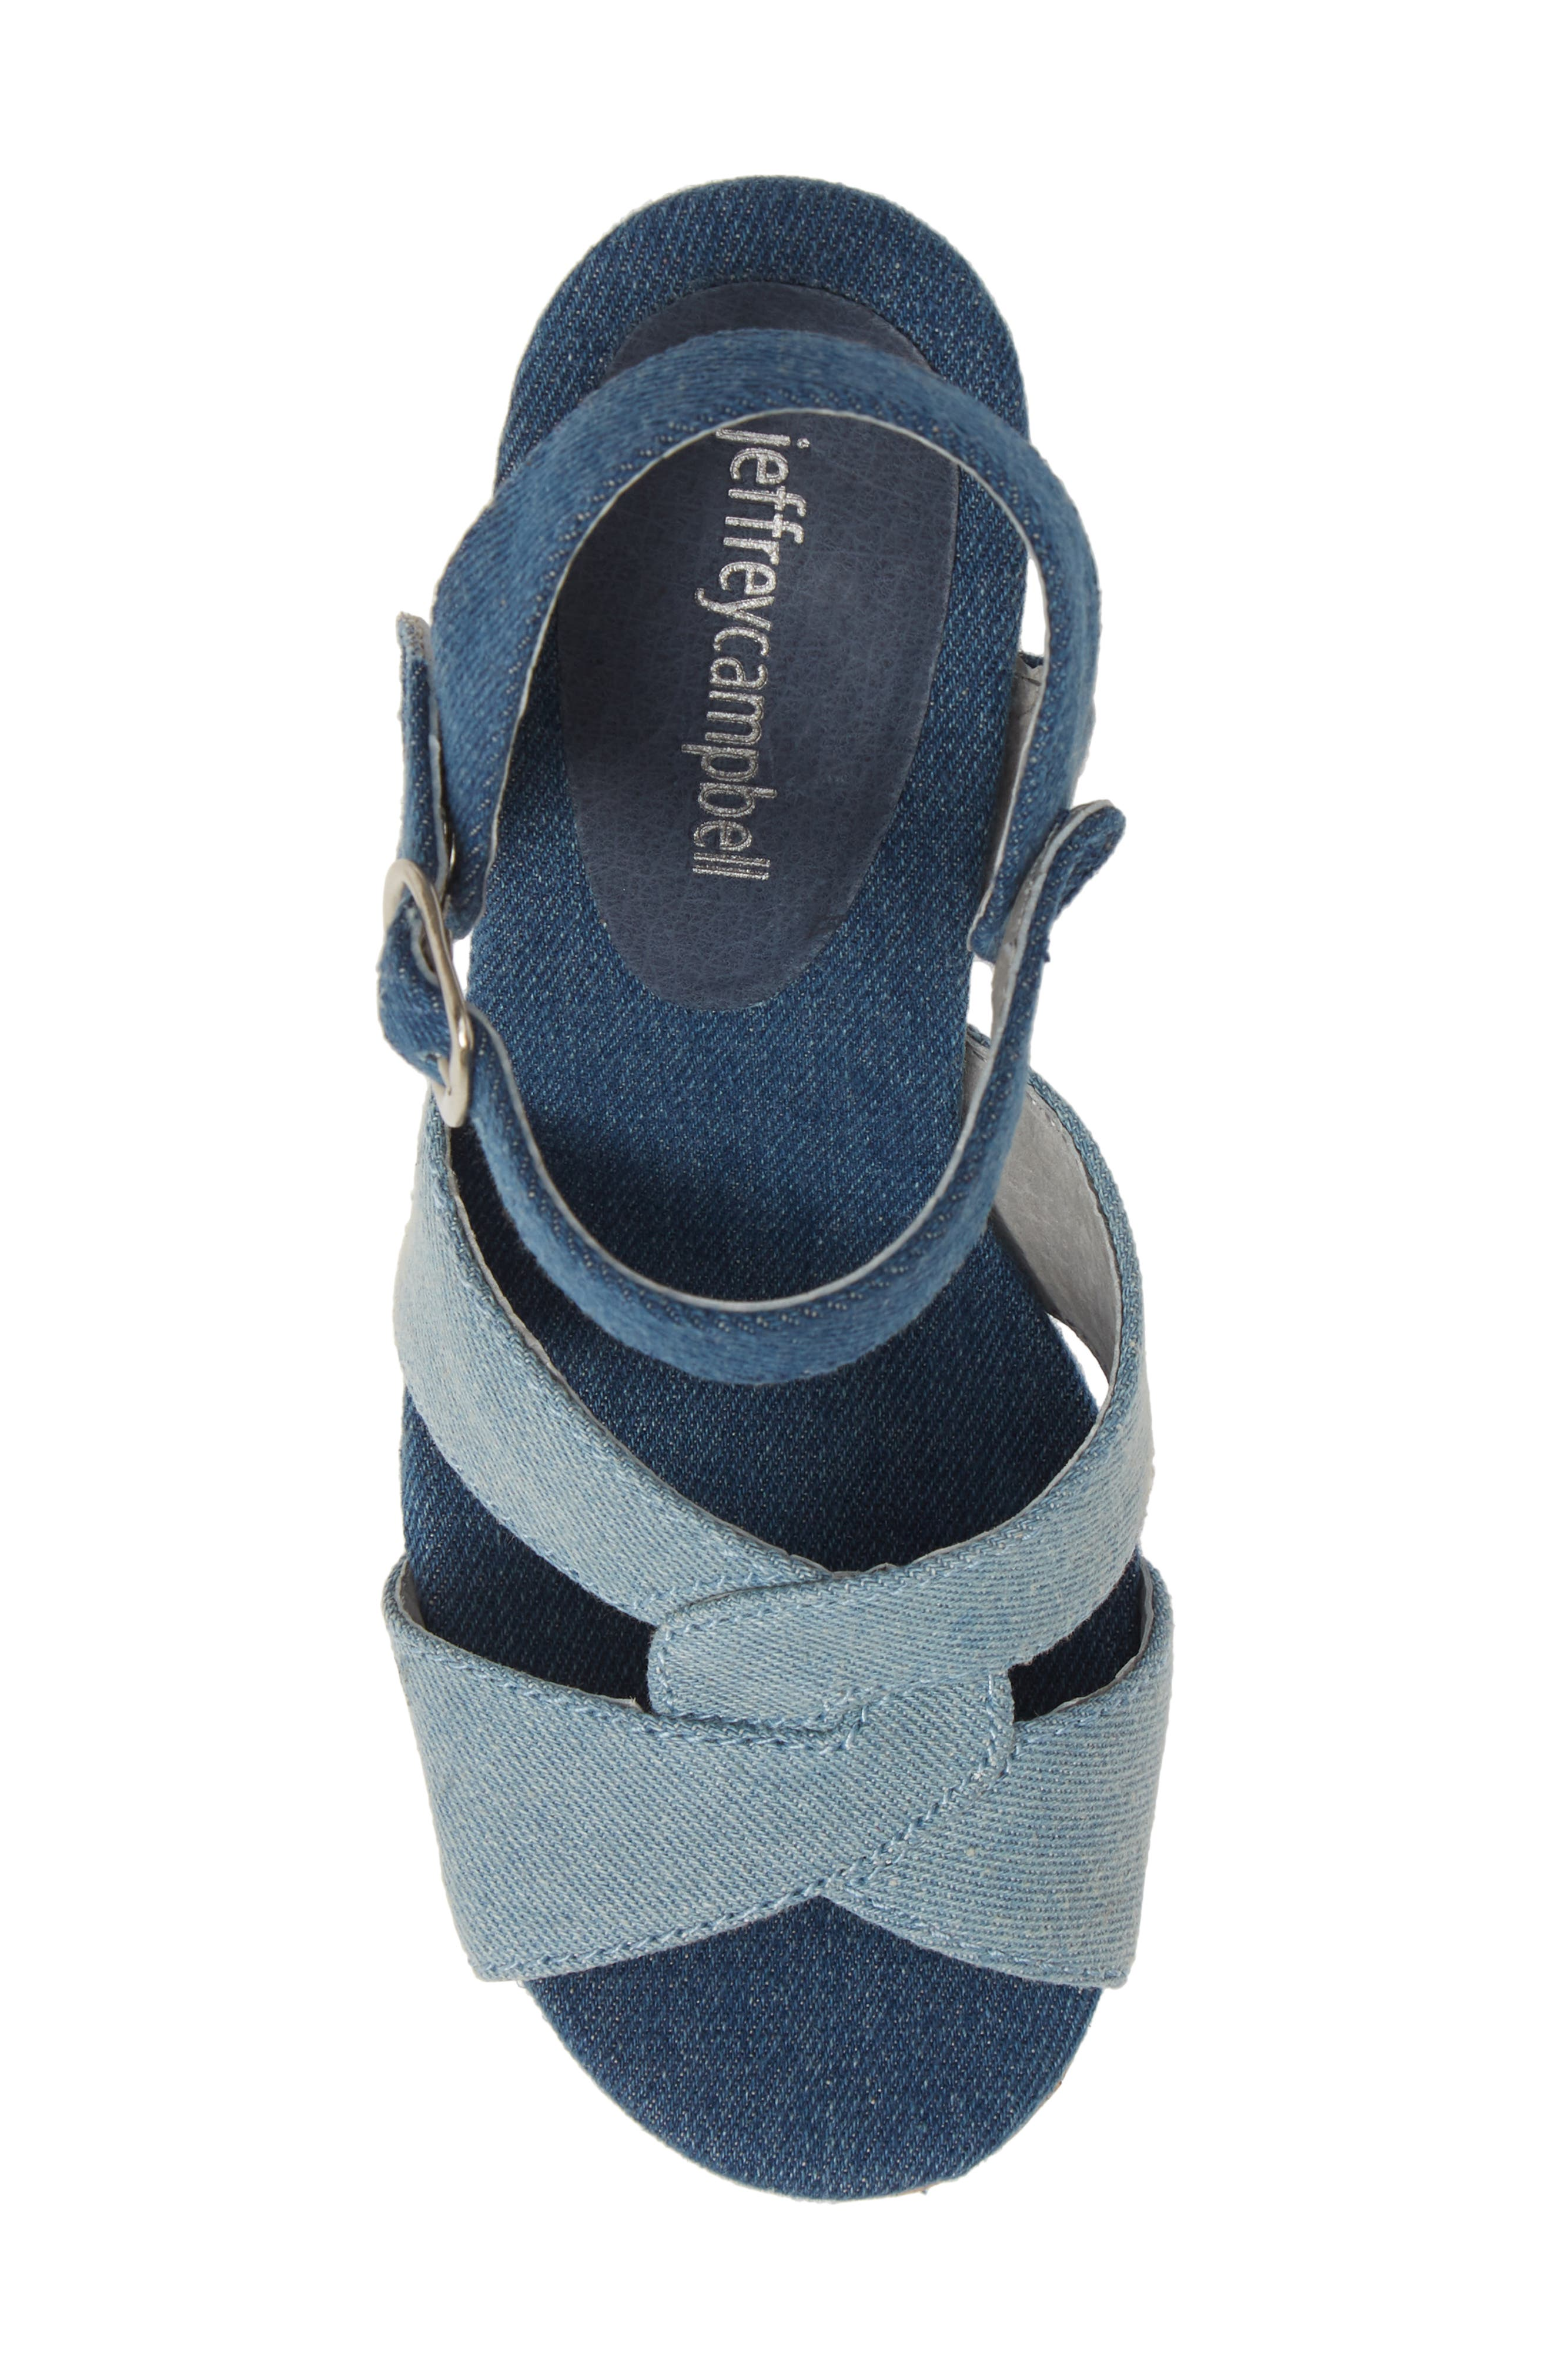 JEFFREY CAMPBELL, Wedge Platform Sandal, Alternate thumbnail 5, color, BLUE DENIM COMBO/ CORK